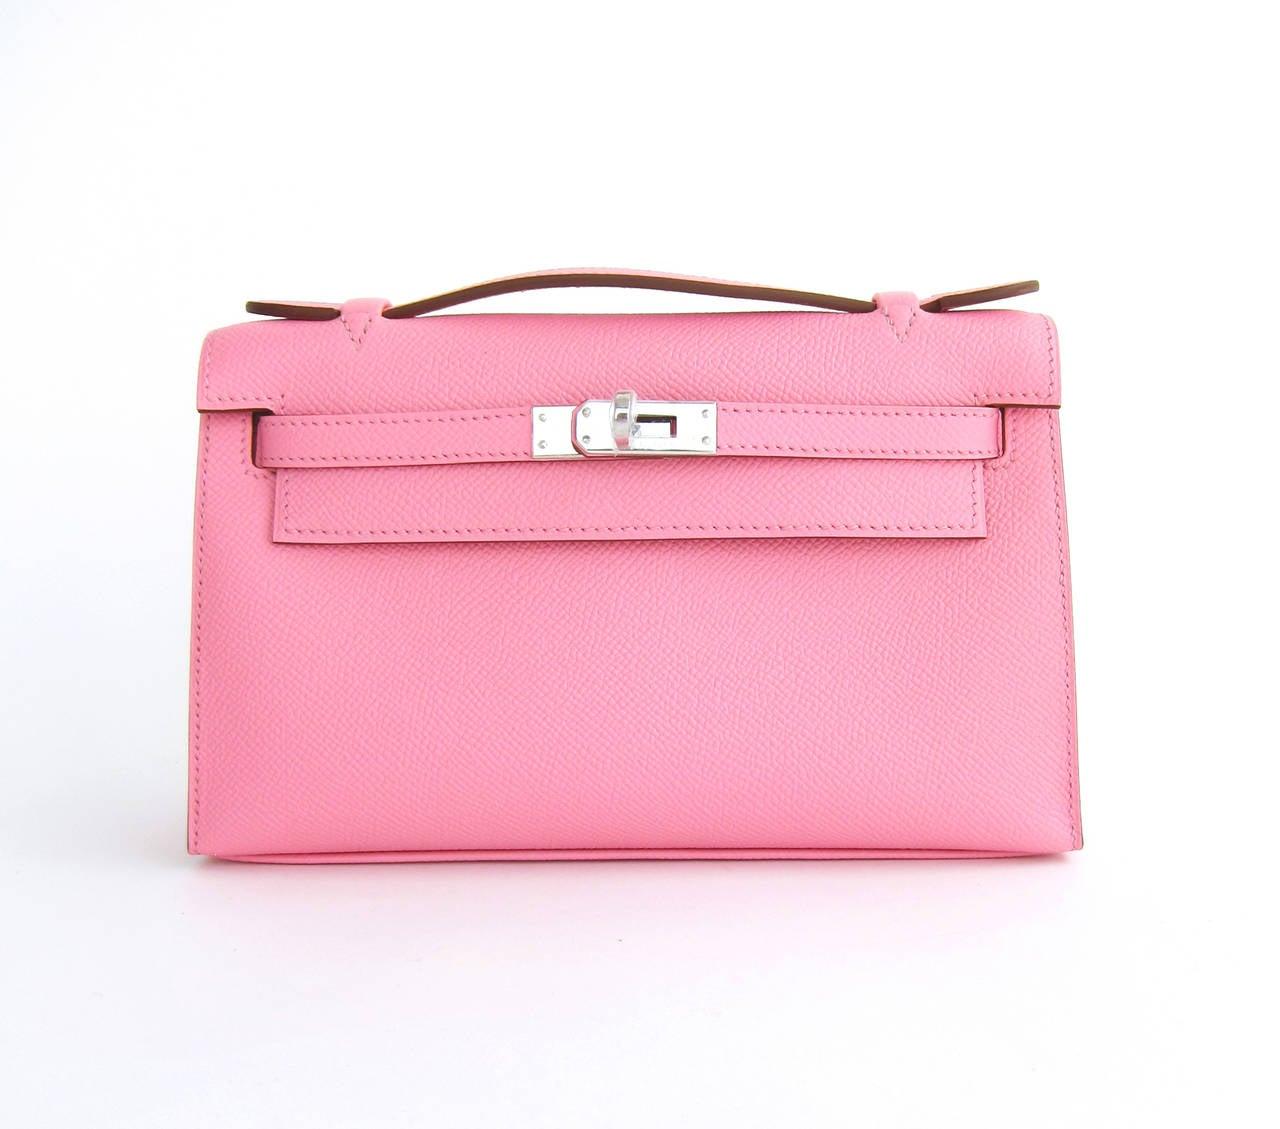 Hermes Rose Confetti Epsom Kelly Pochette Pink Clutch Bag Love For Sale 6